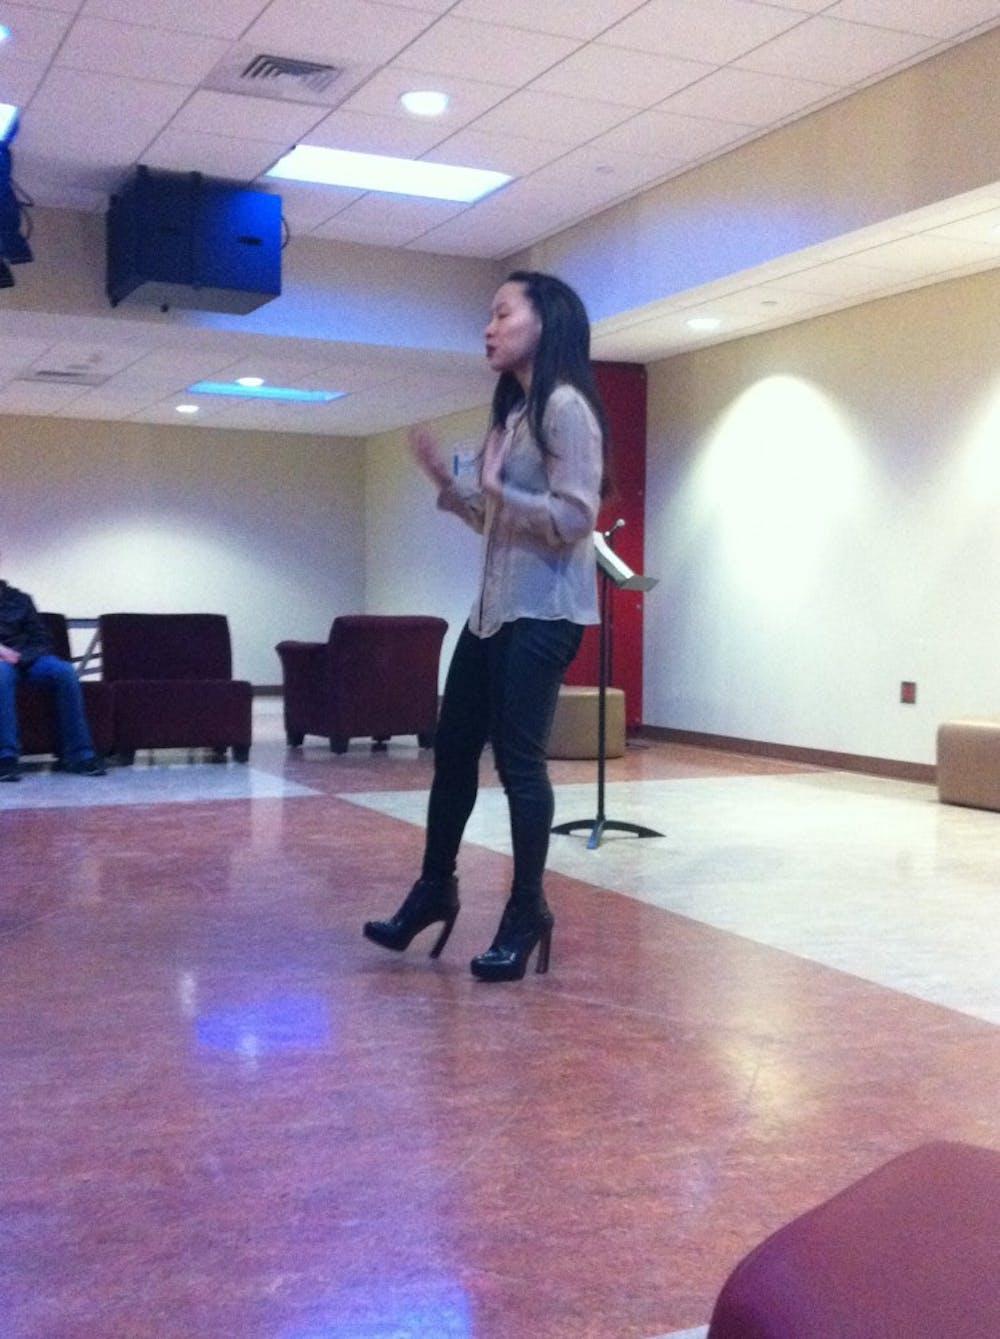 Spoken word artist expresses heritage through poetry